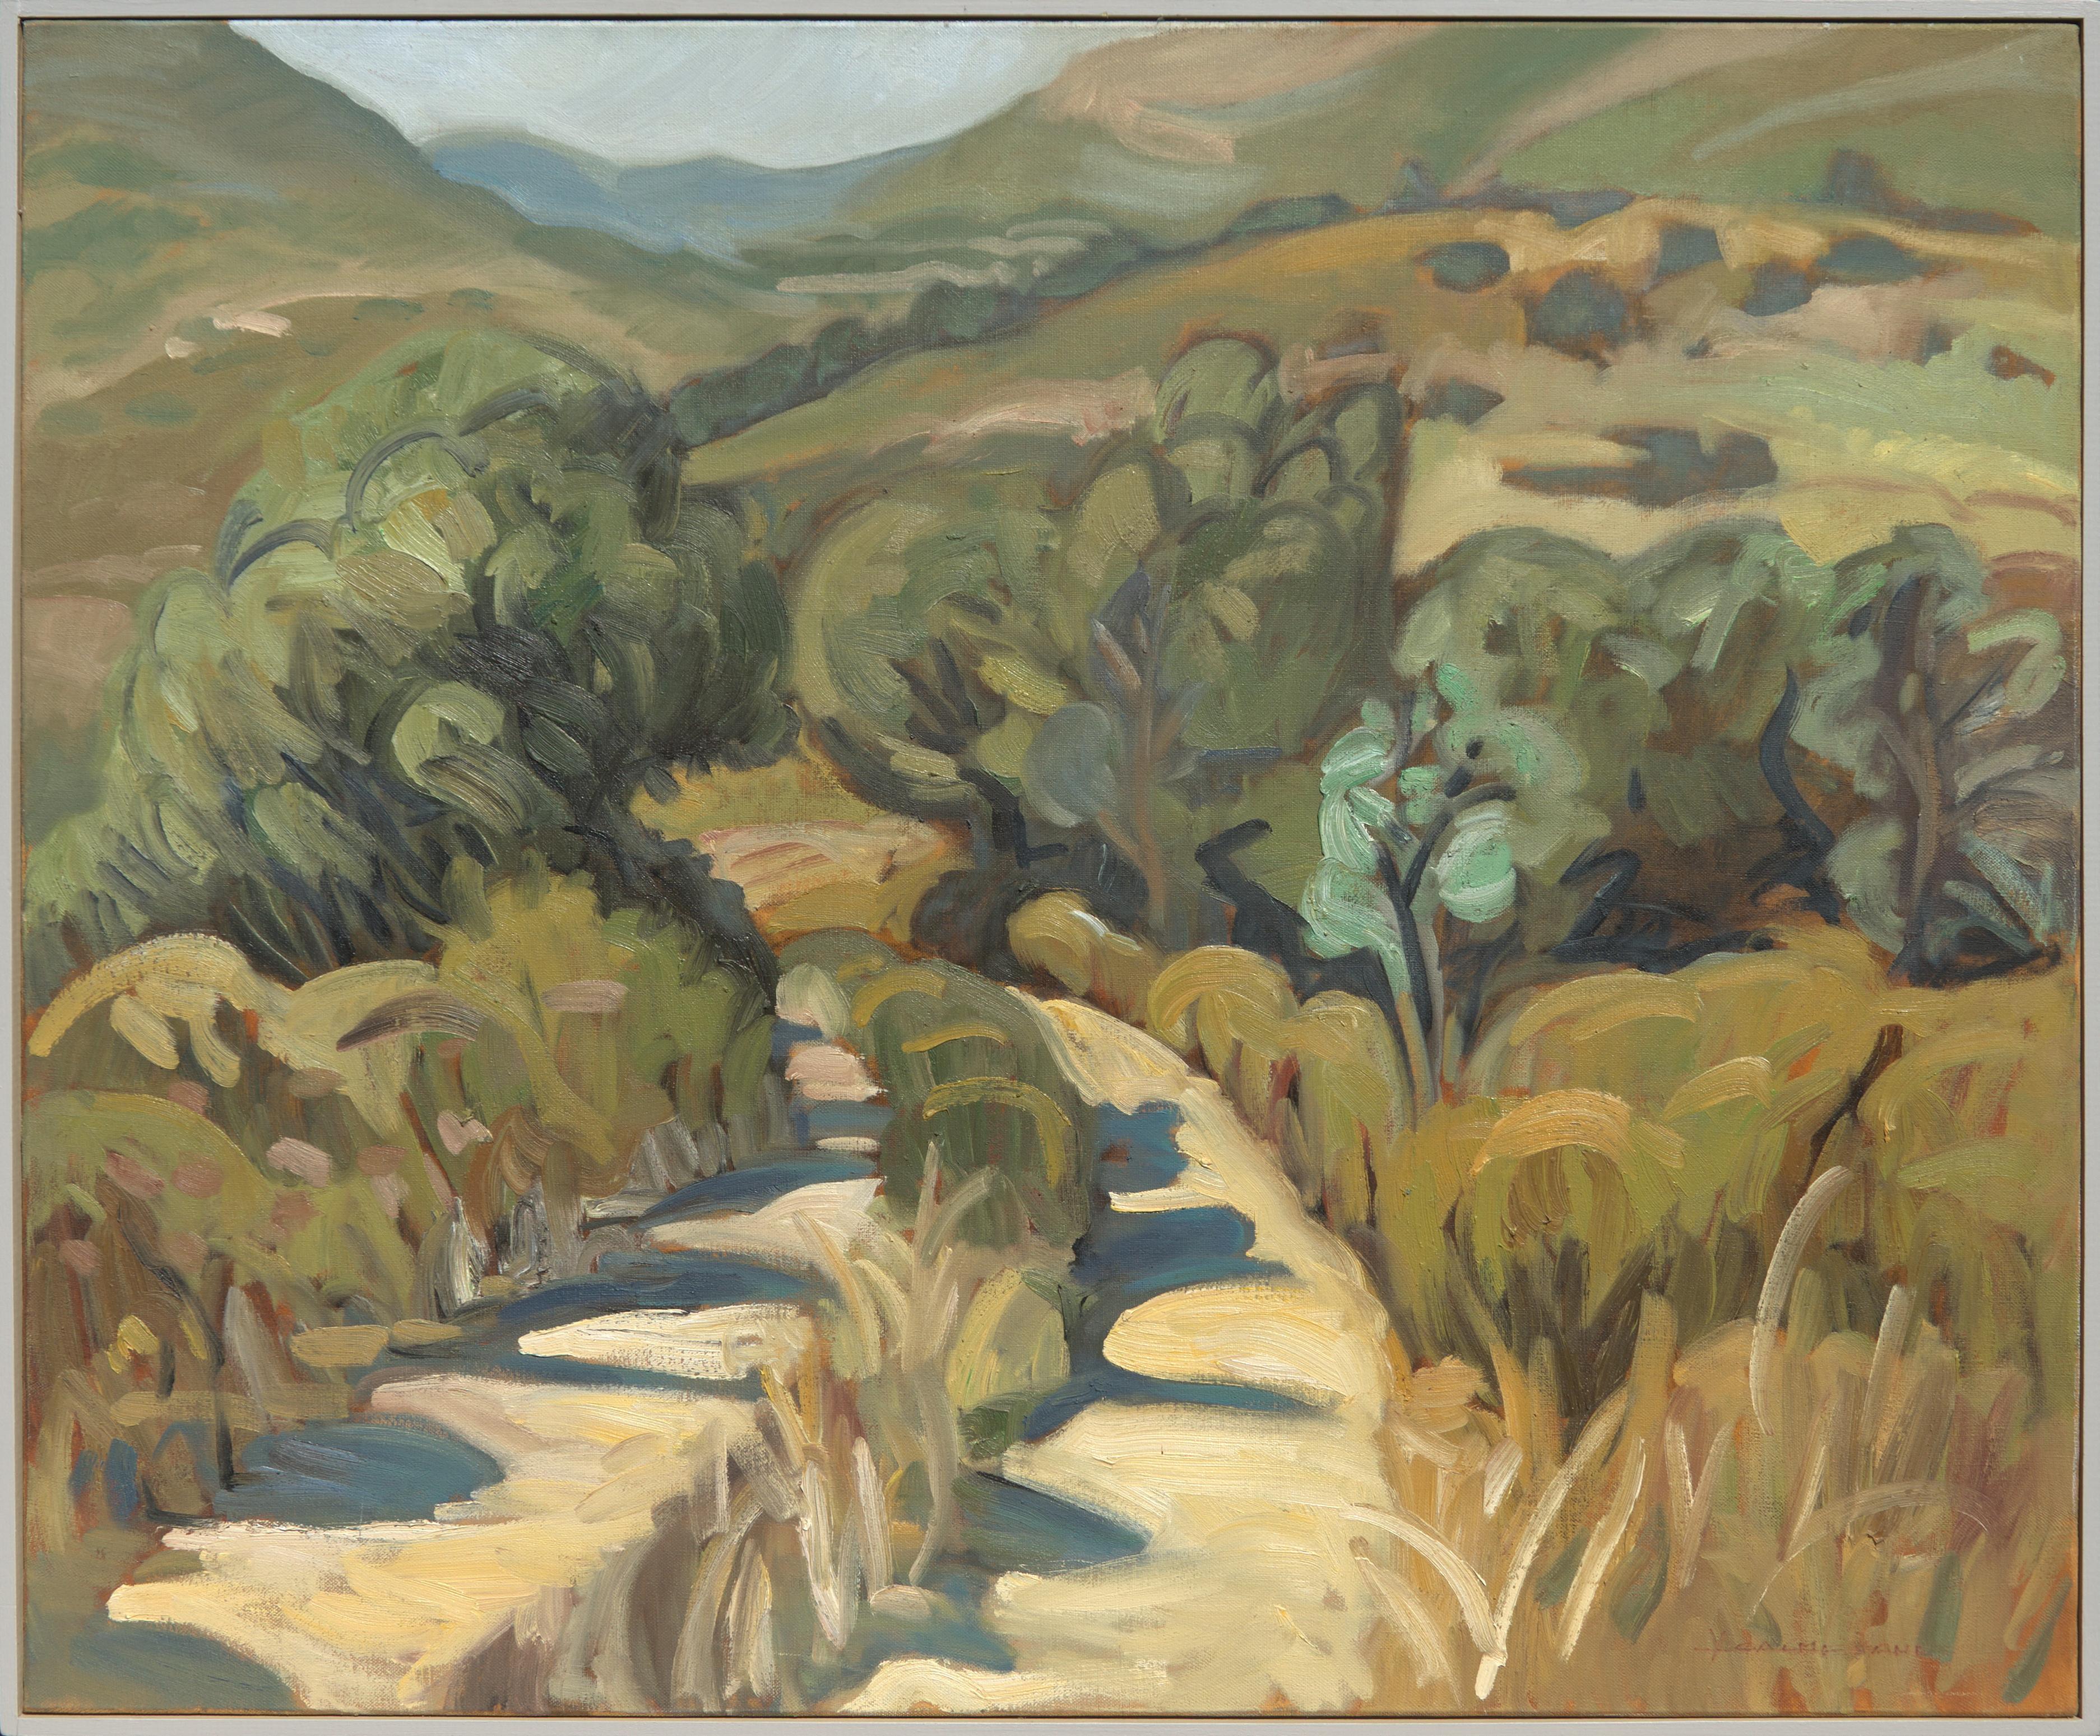 """Hiking Plan"", Mountainous Dirt Path Impressionist Landscape Oil Painting"